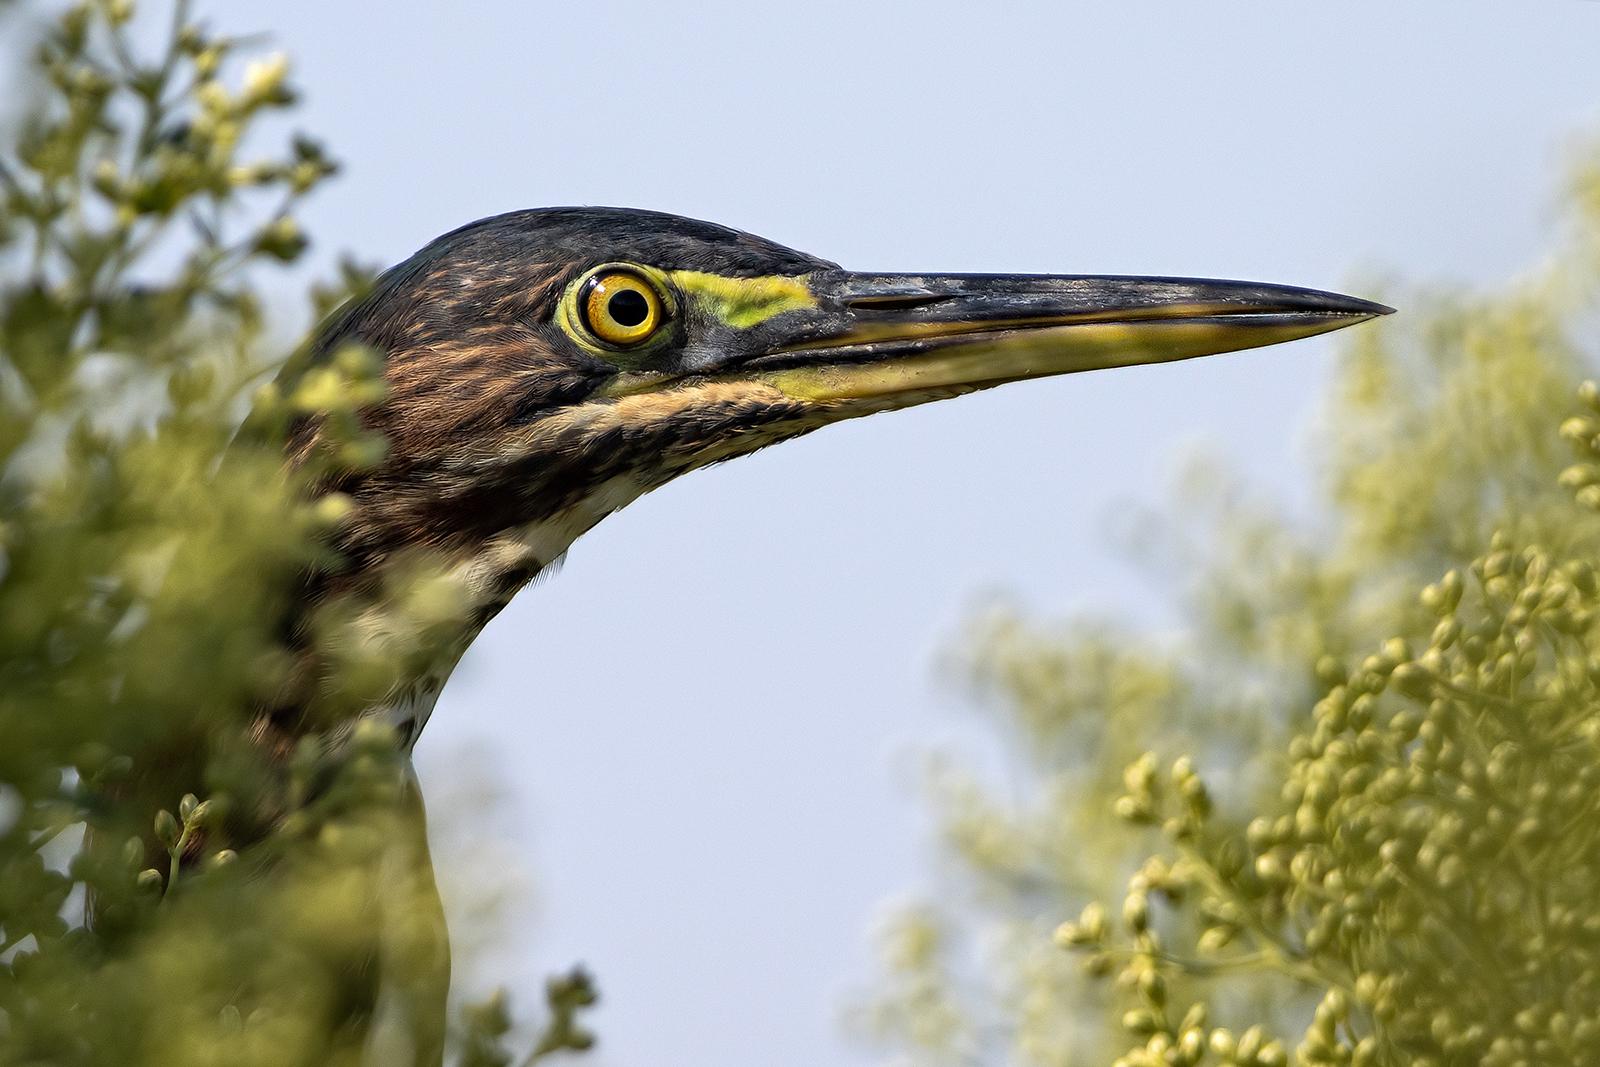 IMAGE: http://markfingar.com/photogallery/Birds/2019/IMG_2204_lr.jpg